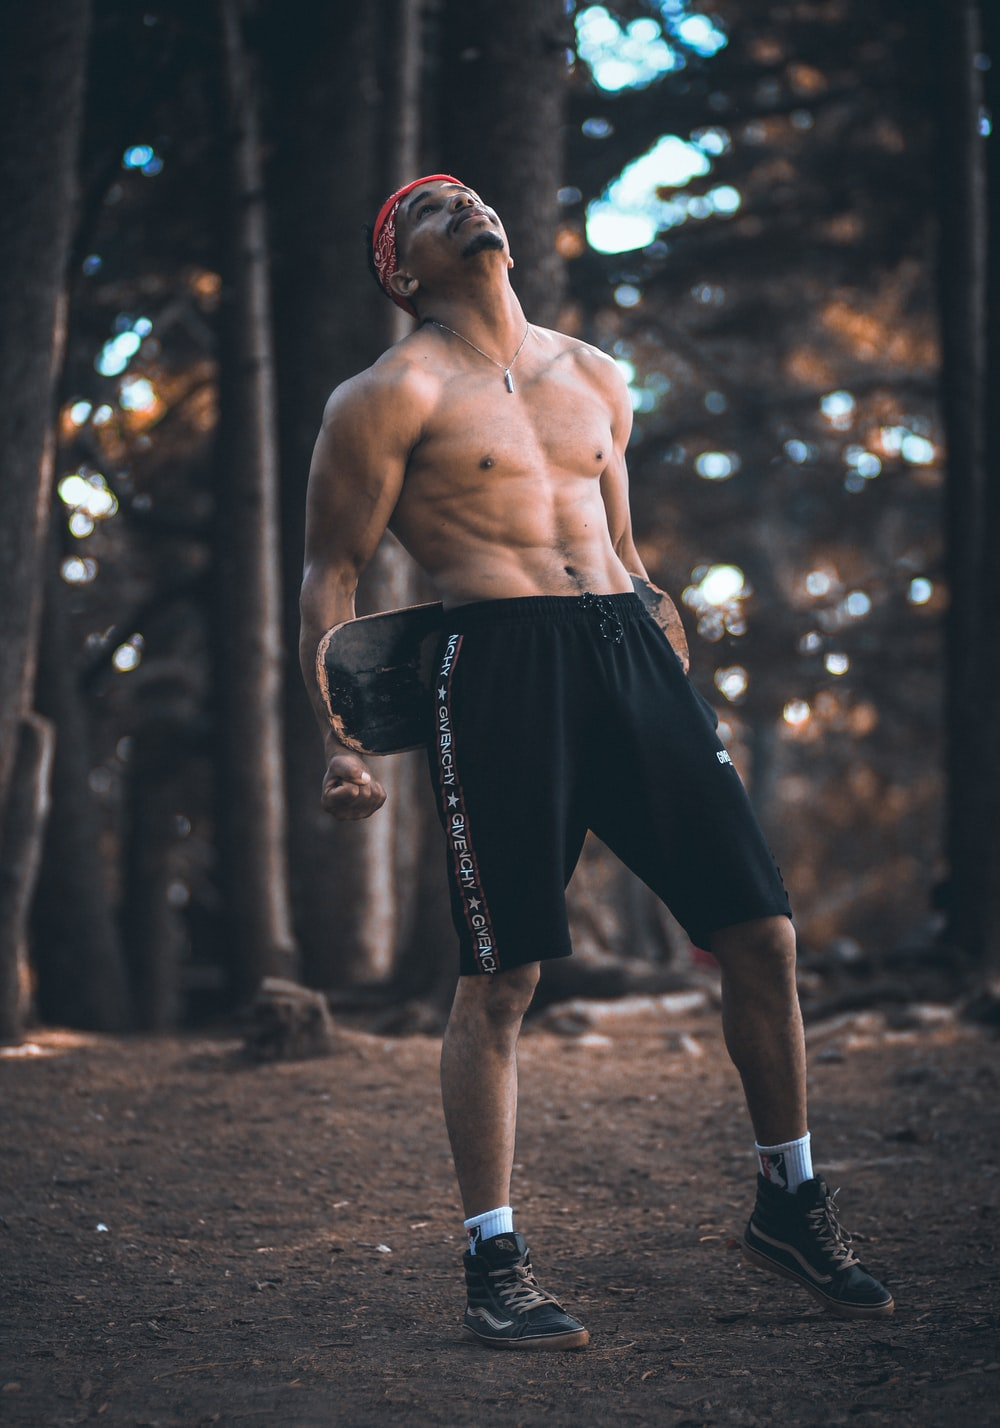 topless man wearing black shorts carrying skateboard